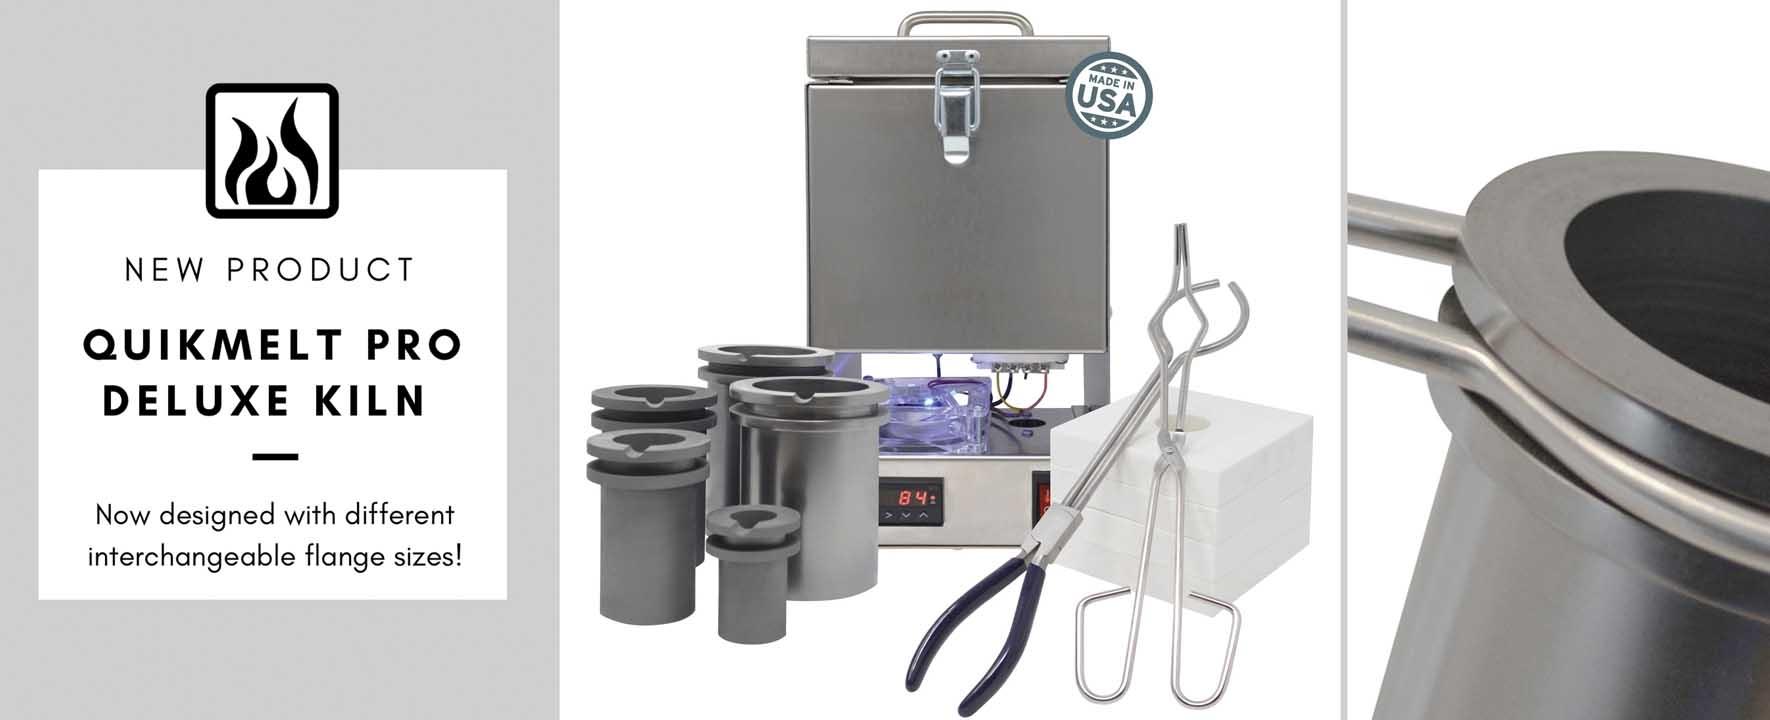 Metal Casting Supplies   PMCSupplies com   PMC Supplies